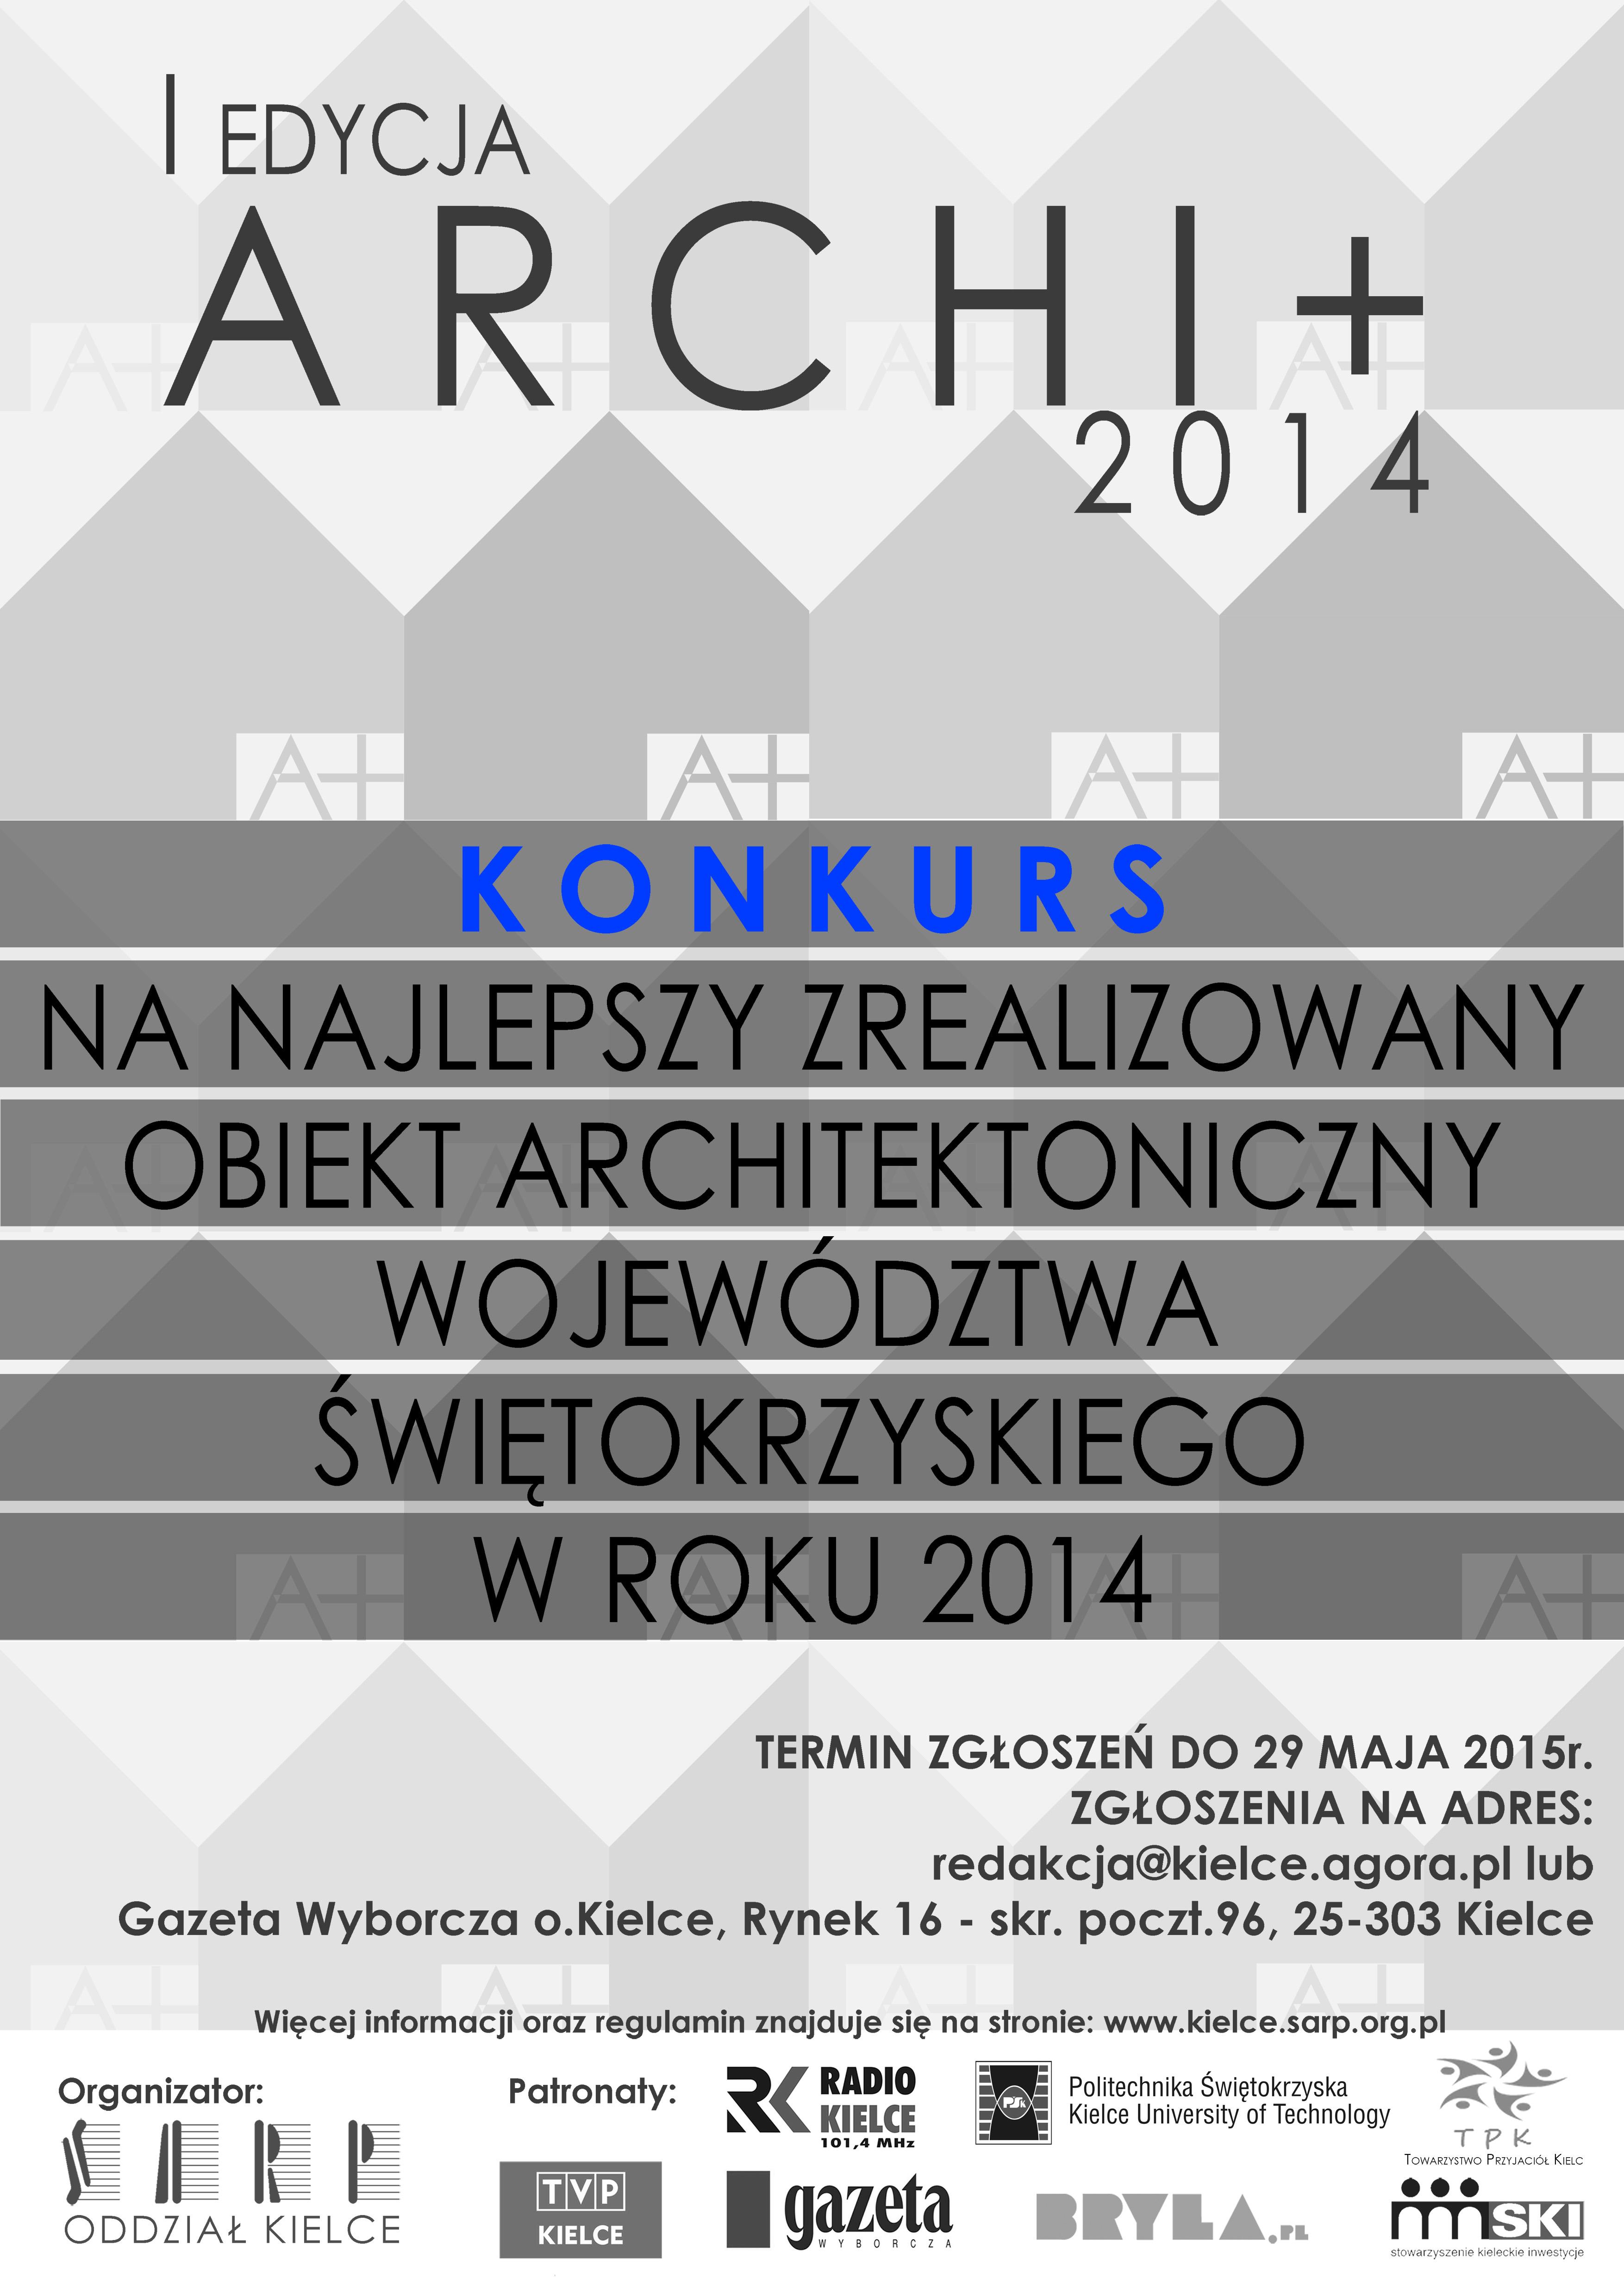 ___Archi+ plakat A3_2015_05_20